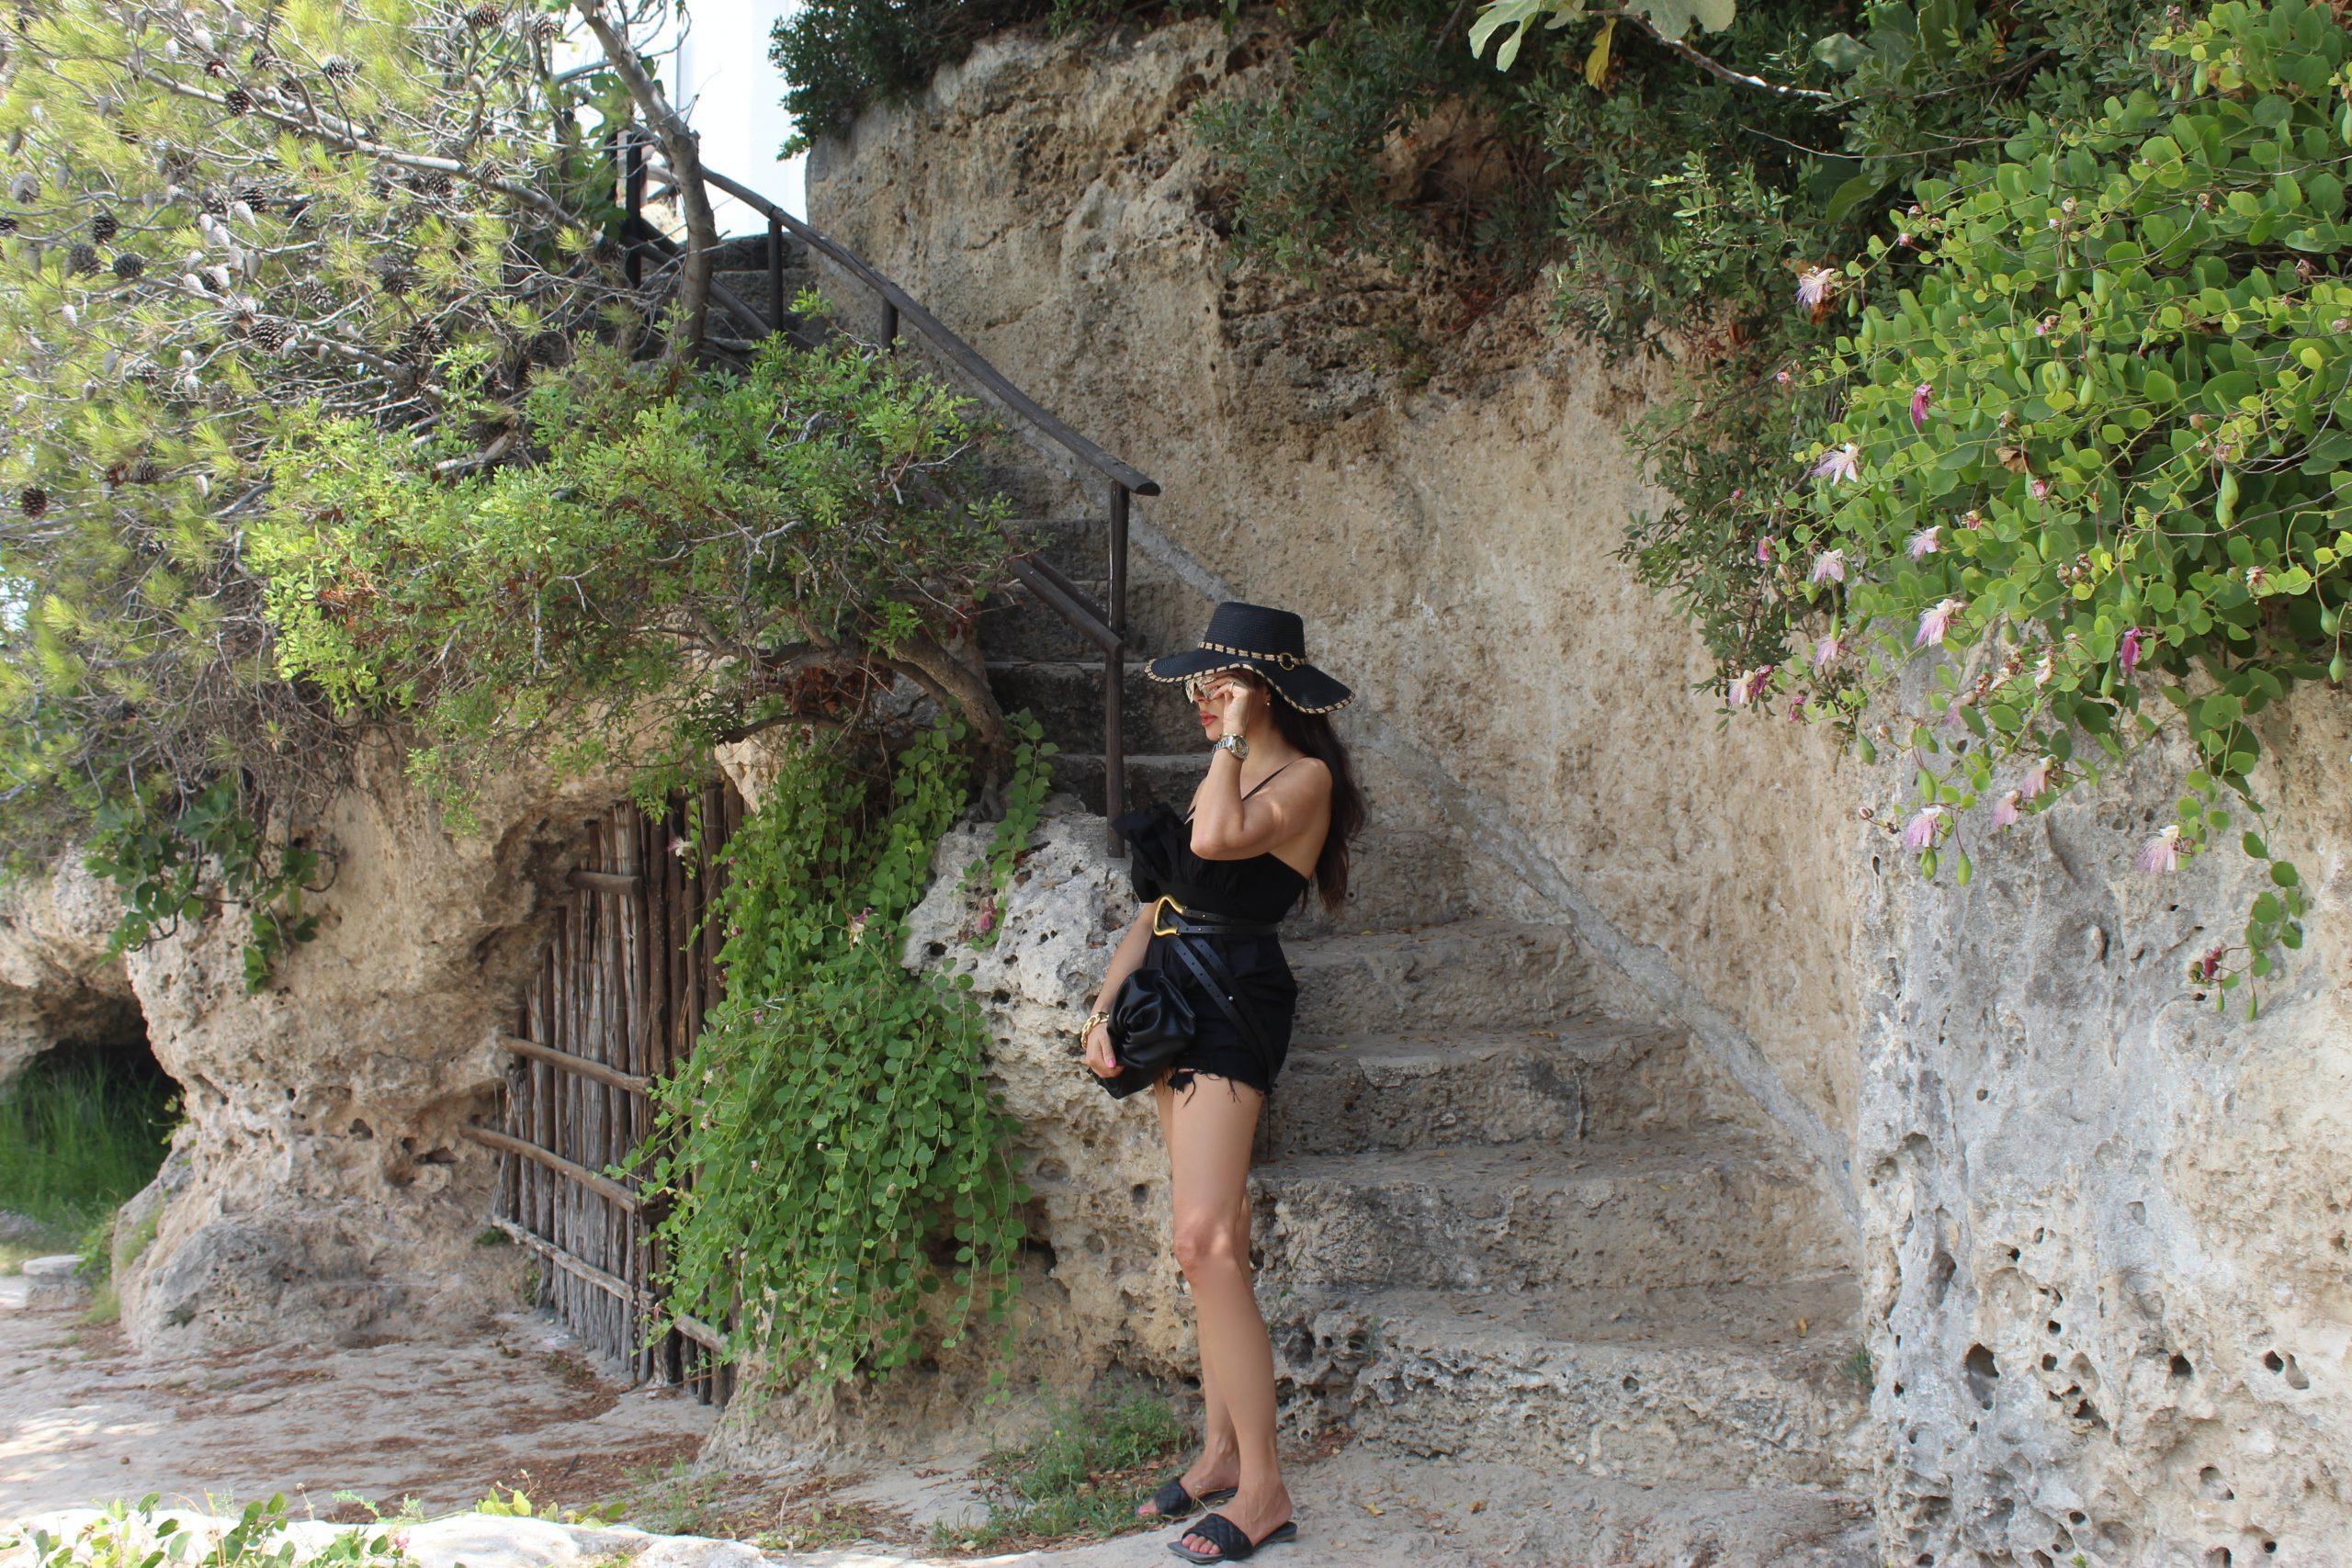 a postcard from Italy Polignano a Mare Puglia Bottega Veneta Summer Inspo Look Paola Lauretano